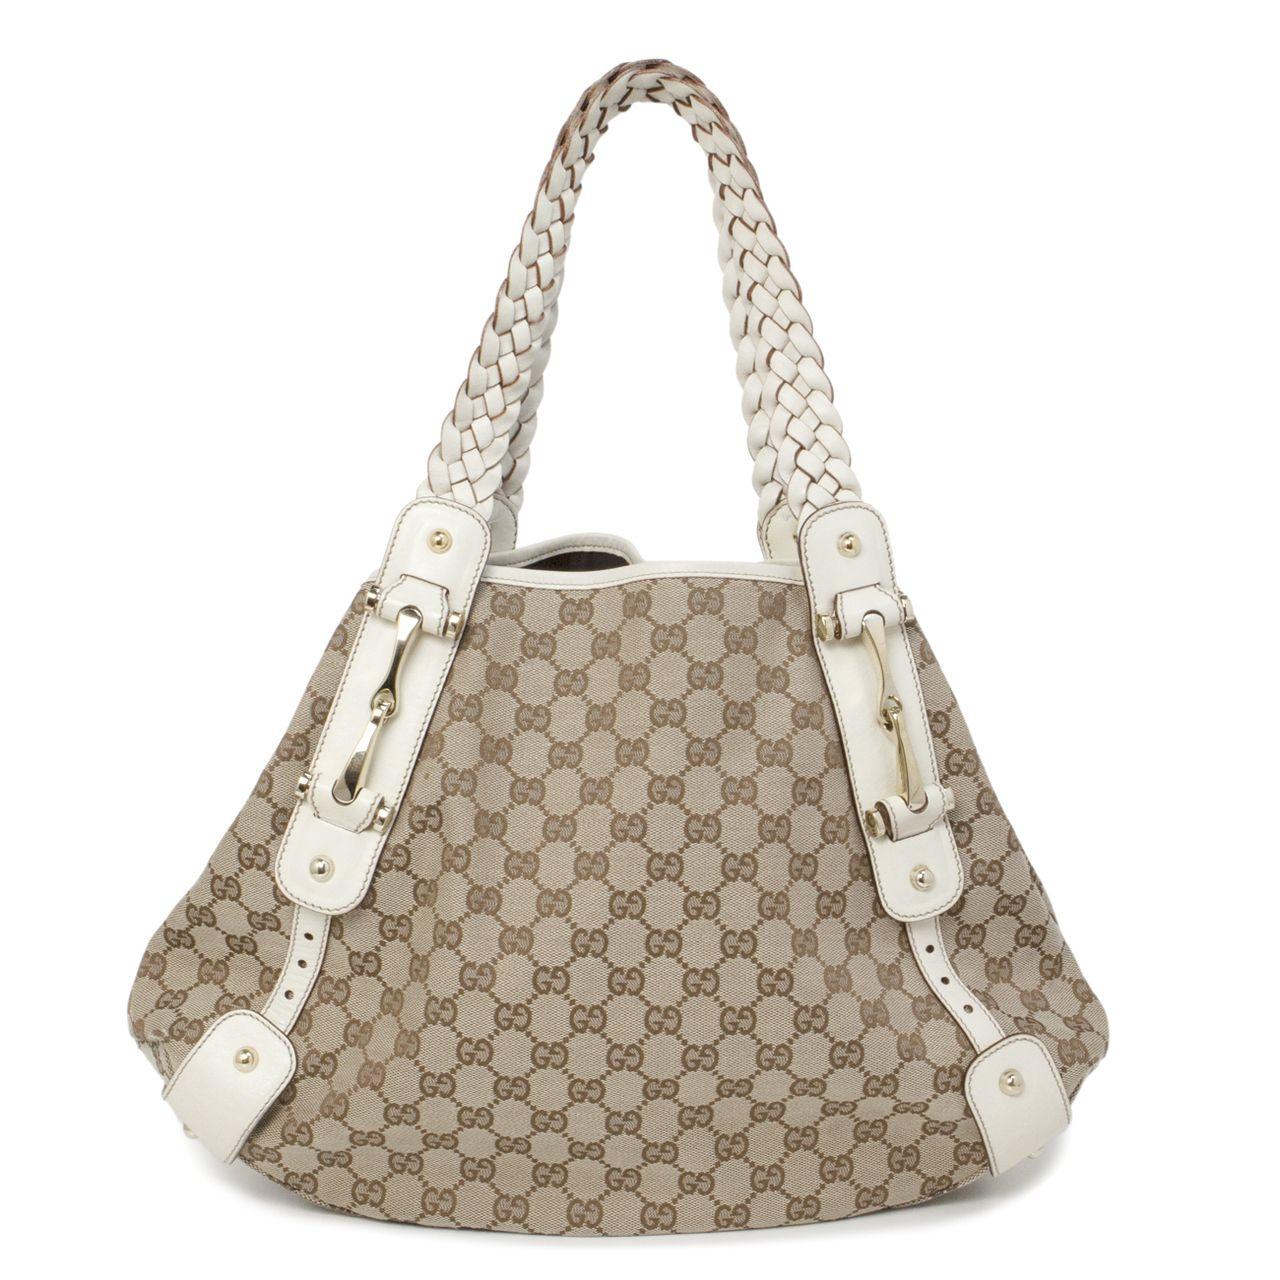 cde3770b4c3f13 Gucci Monogram Canvas Medium Pelham Shoulder Bag - modaselle | Gucci ...